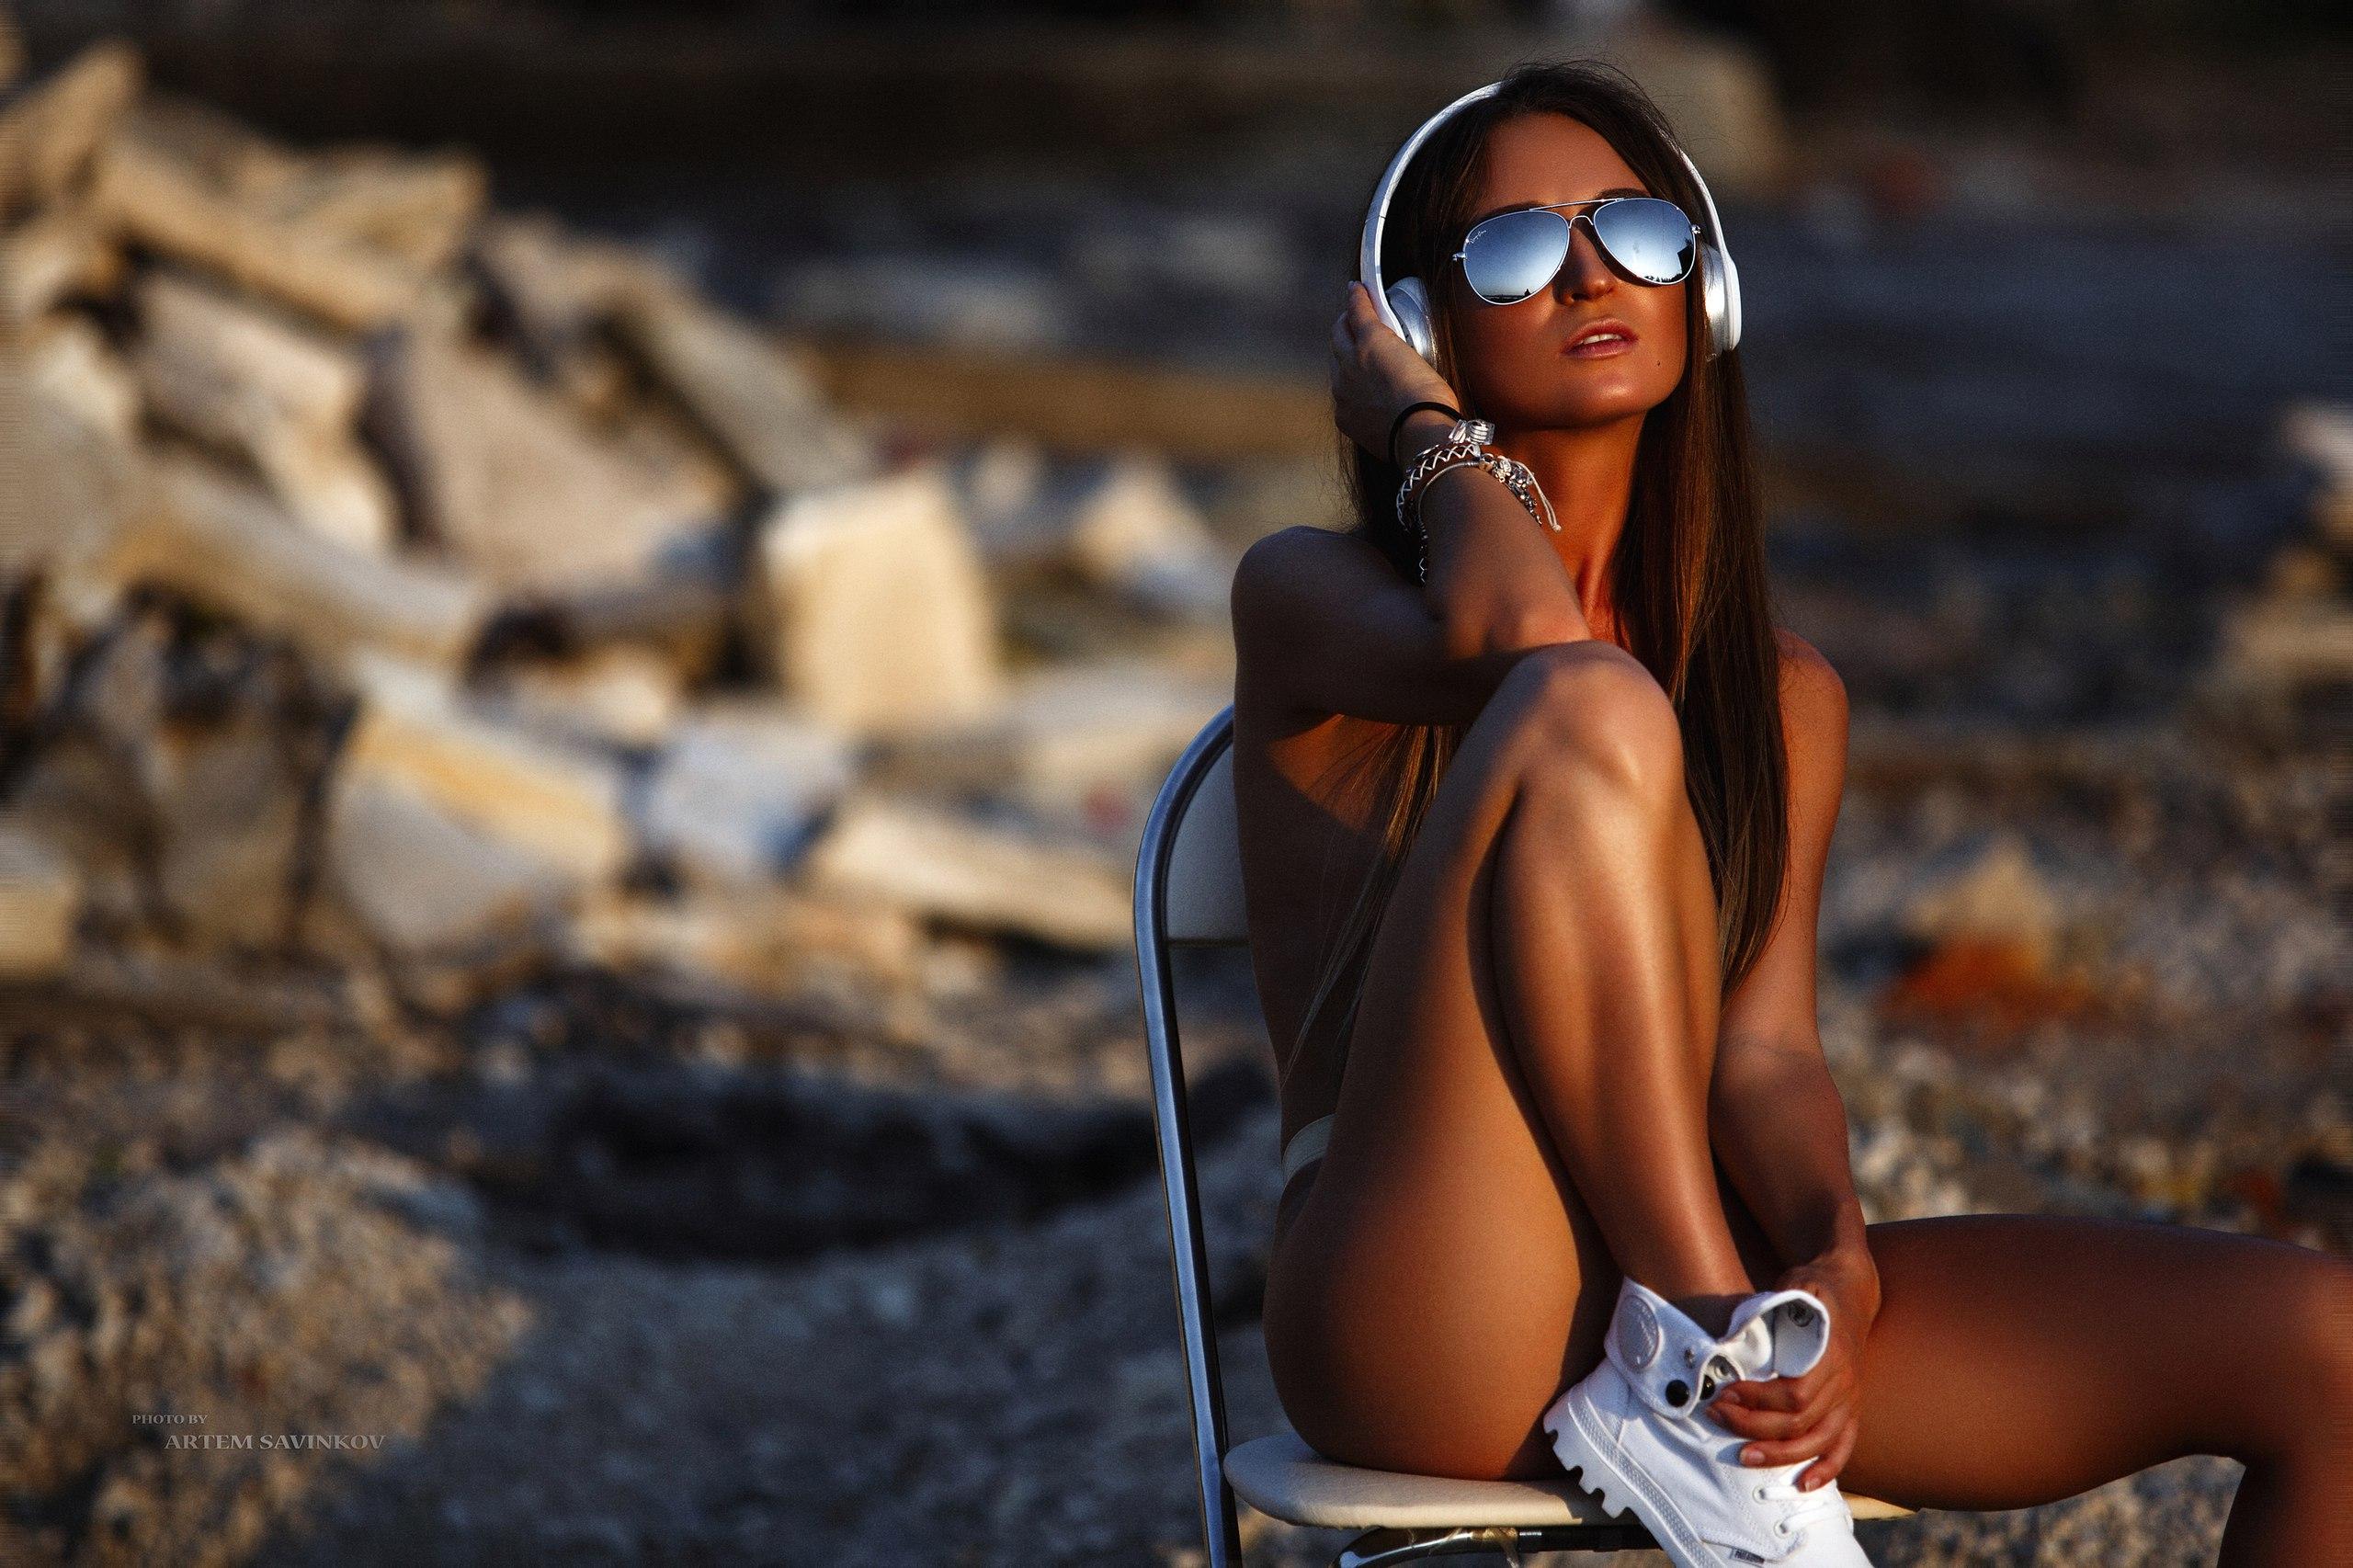 People 2560x1706 women brunette women with shades chair tanned sunglasses headphones topless strategic covering sunset sitting spread legs Artem Savinkov Ray-Ban Aniuta Furnosova